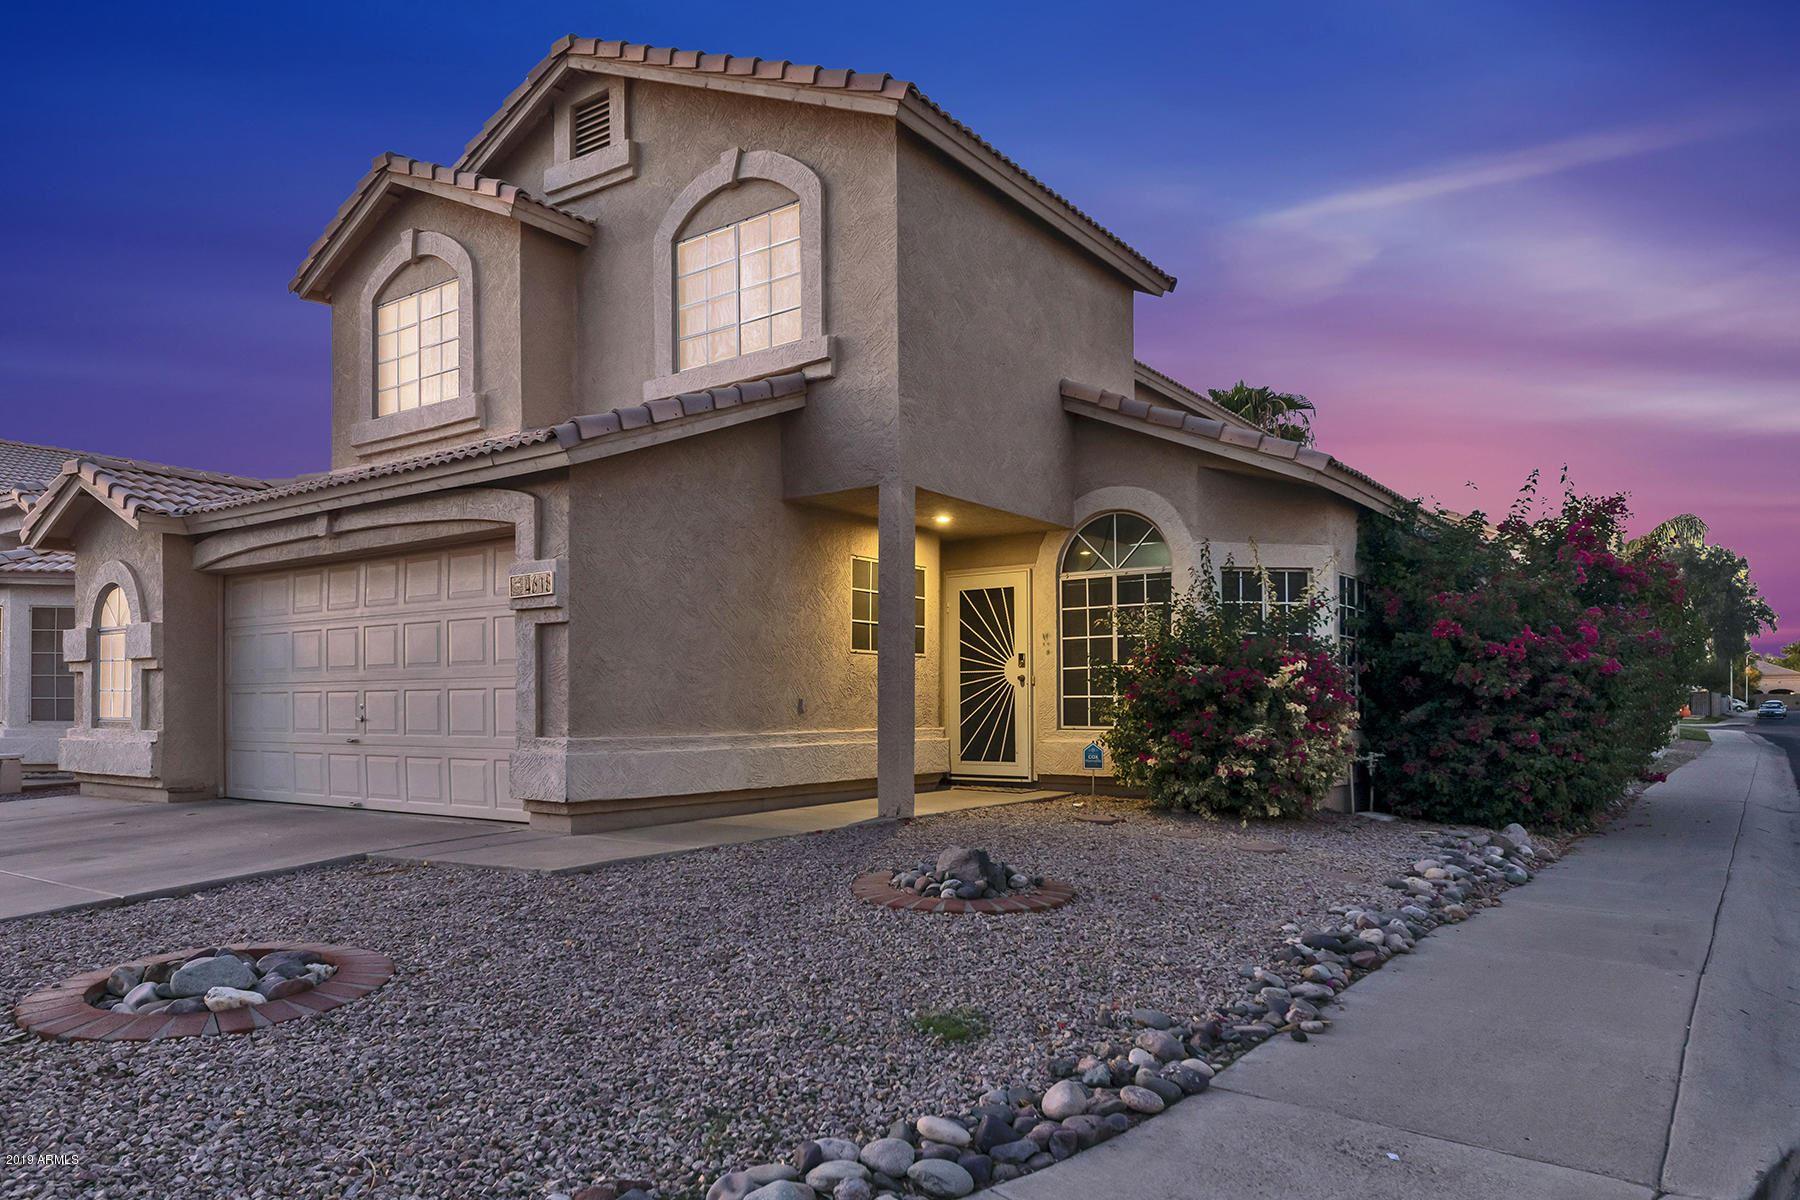 4618 E DOUGLAS Avenue, Gilbert, AZ 85234 - MLS#: 6057593